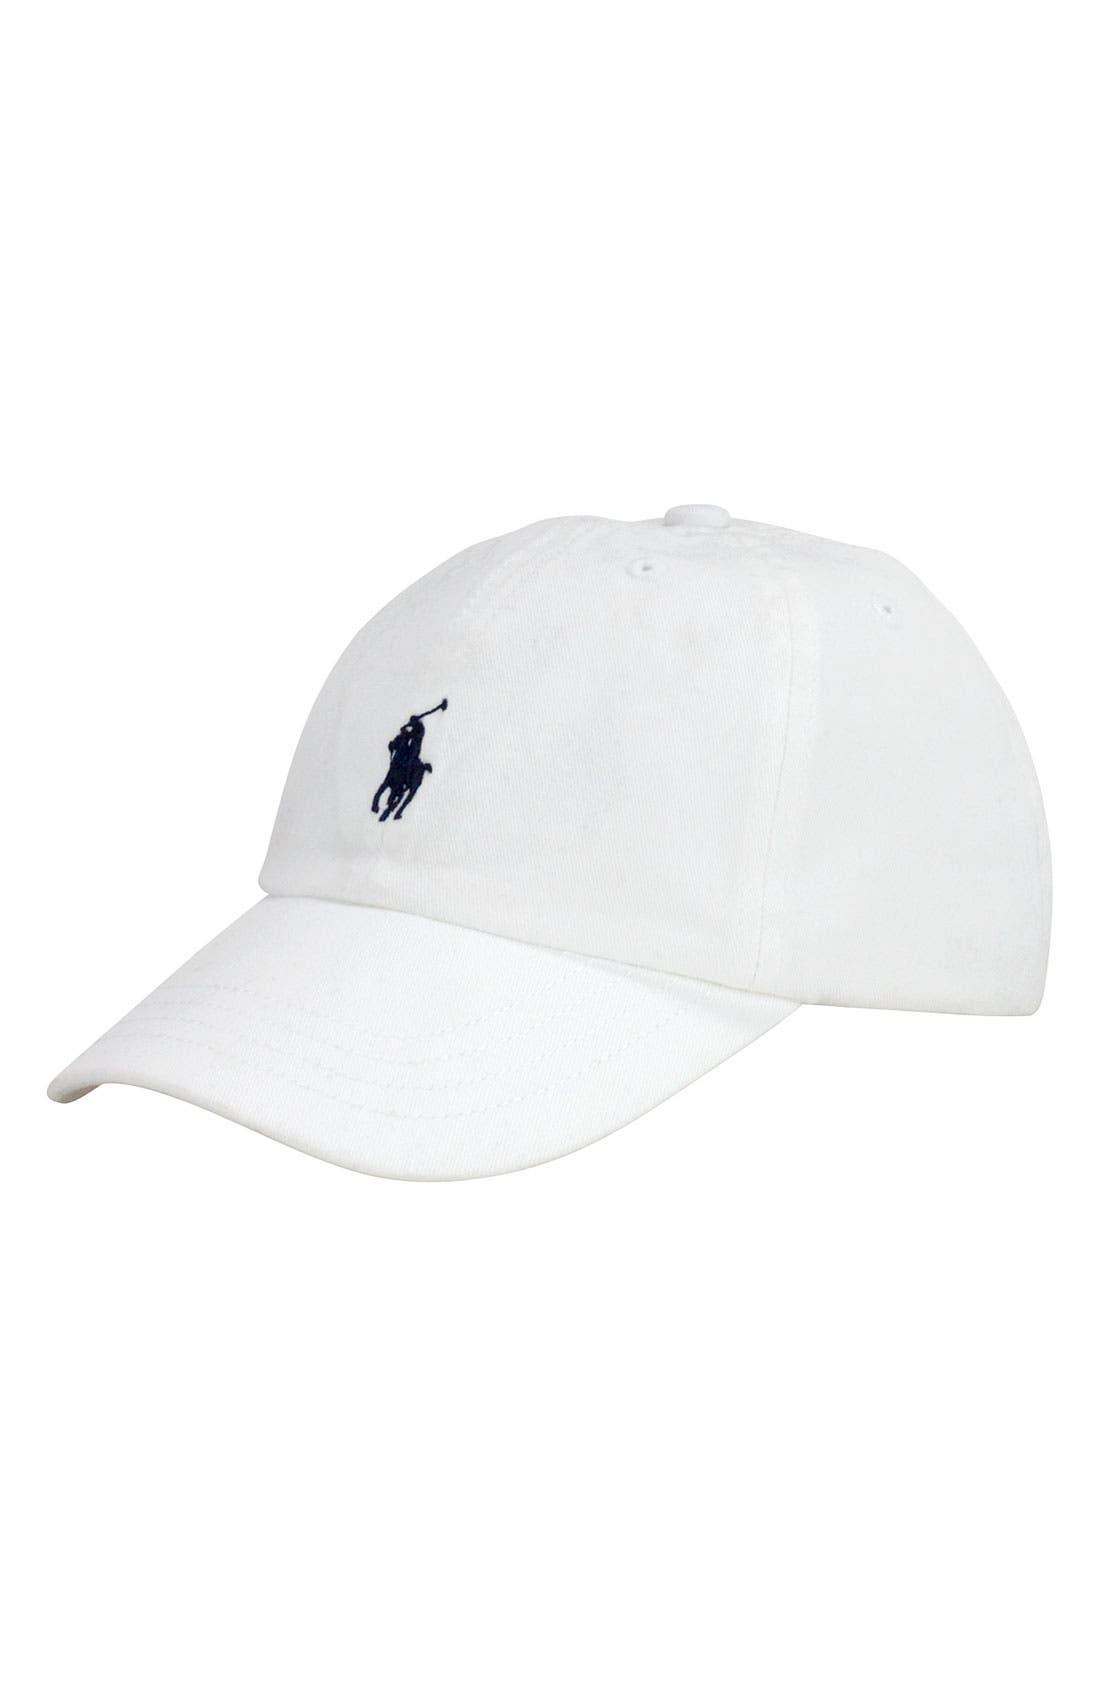 Alternate Image 1 Selected - Ralph Lauren Baseball Cap (Toddler)